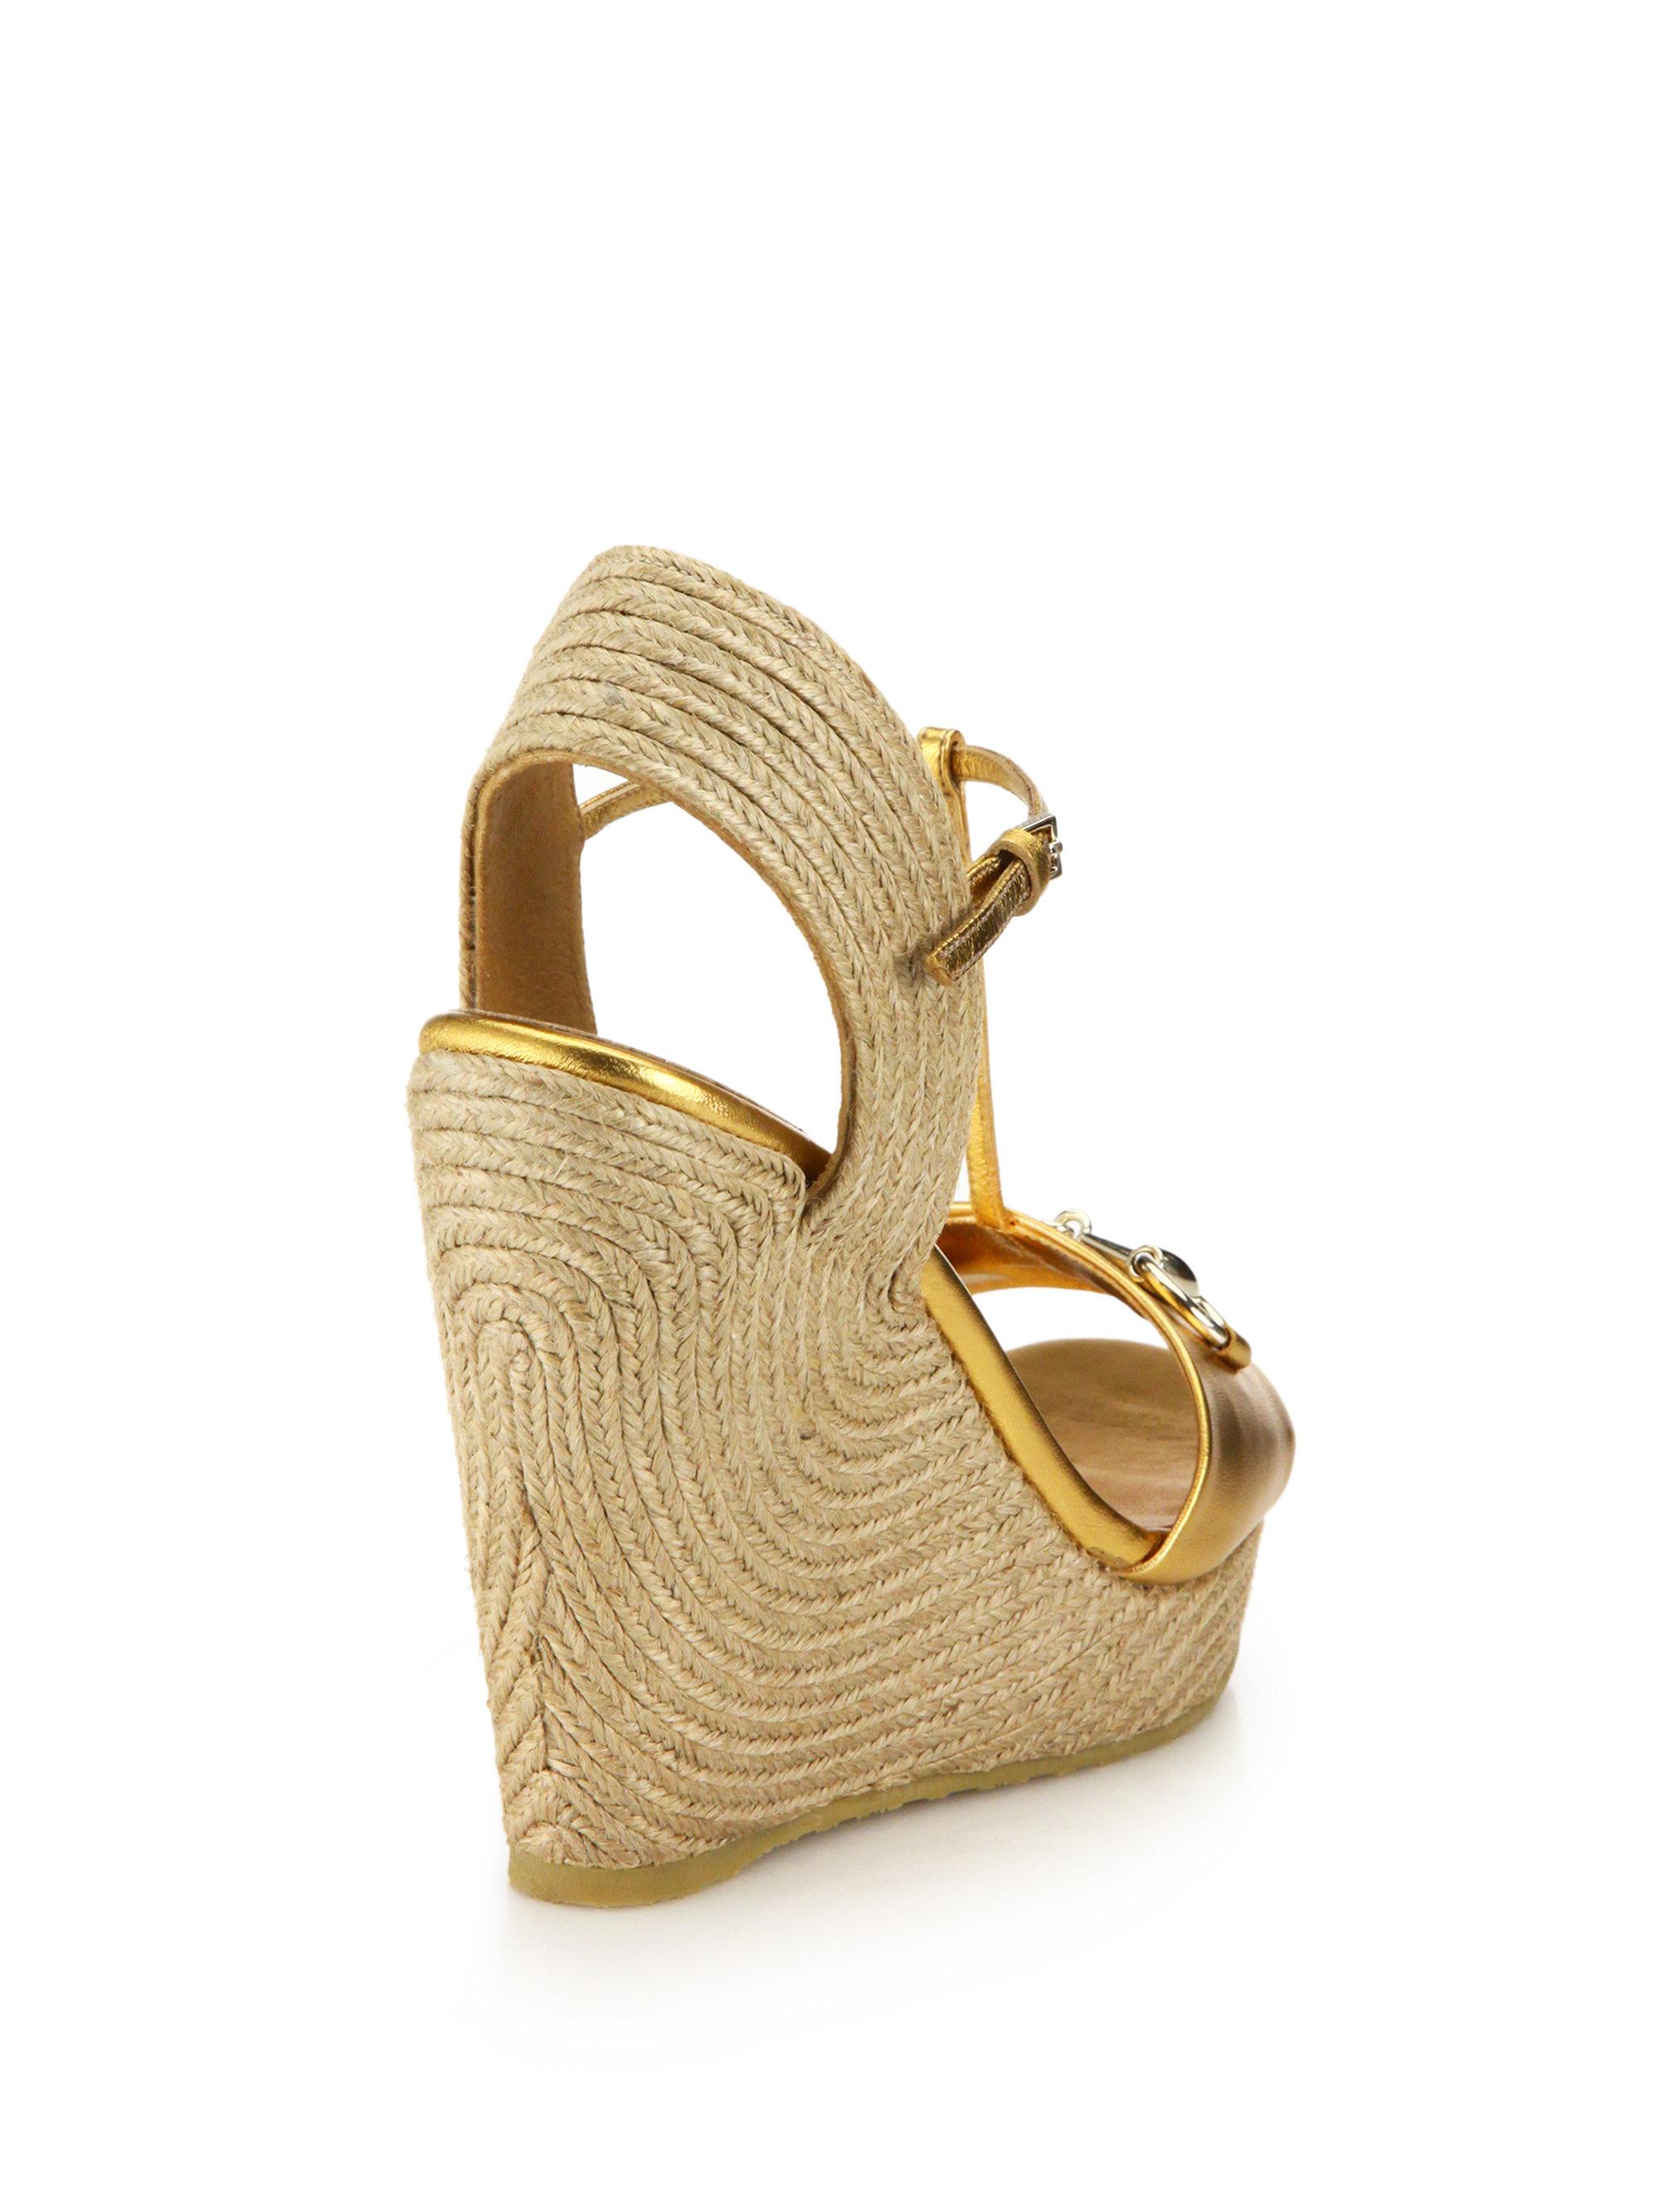 4c730b08f29 Lyst - Gucci Metallic Leather Horsebit Espadrille Wedge Sandals in ...